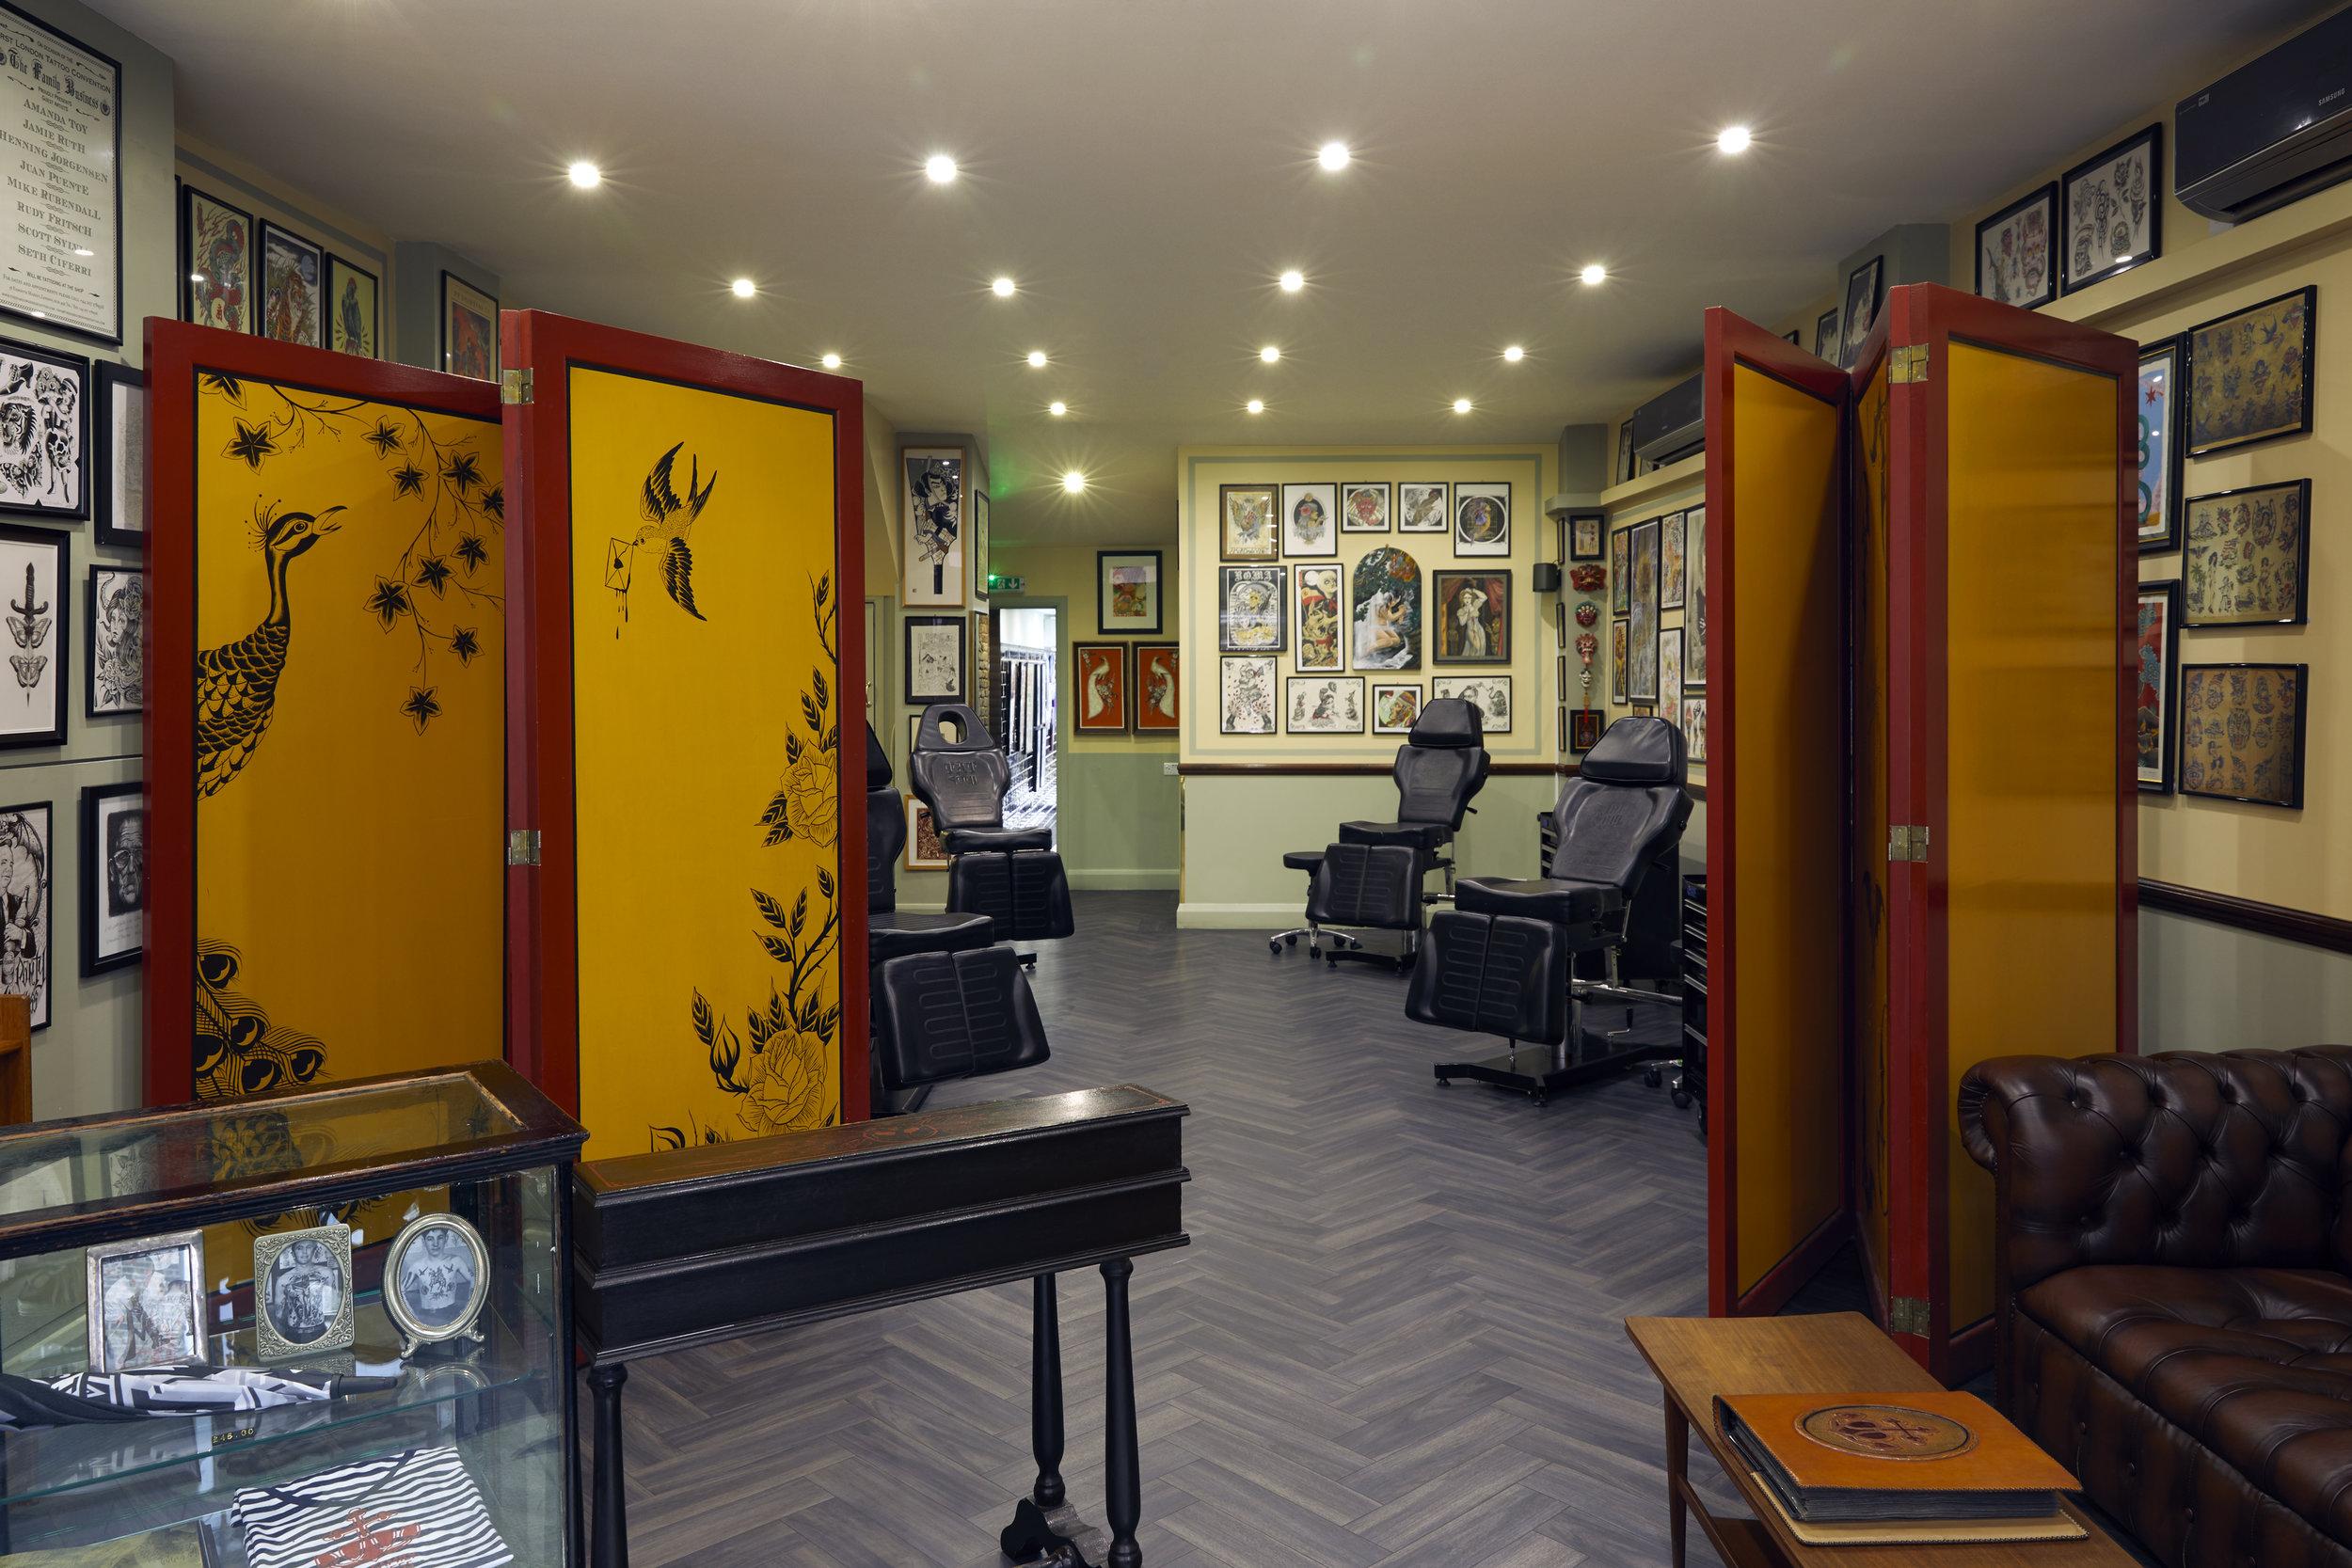 Front Room_Shutters open.jpg